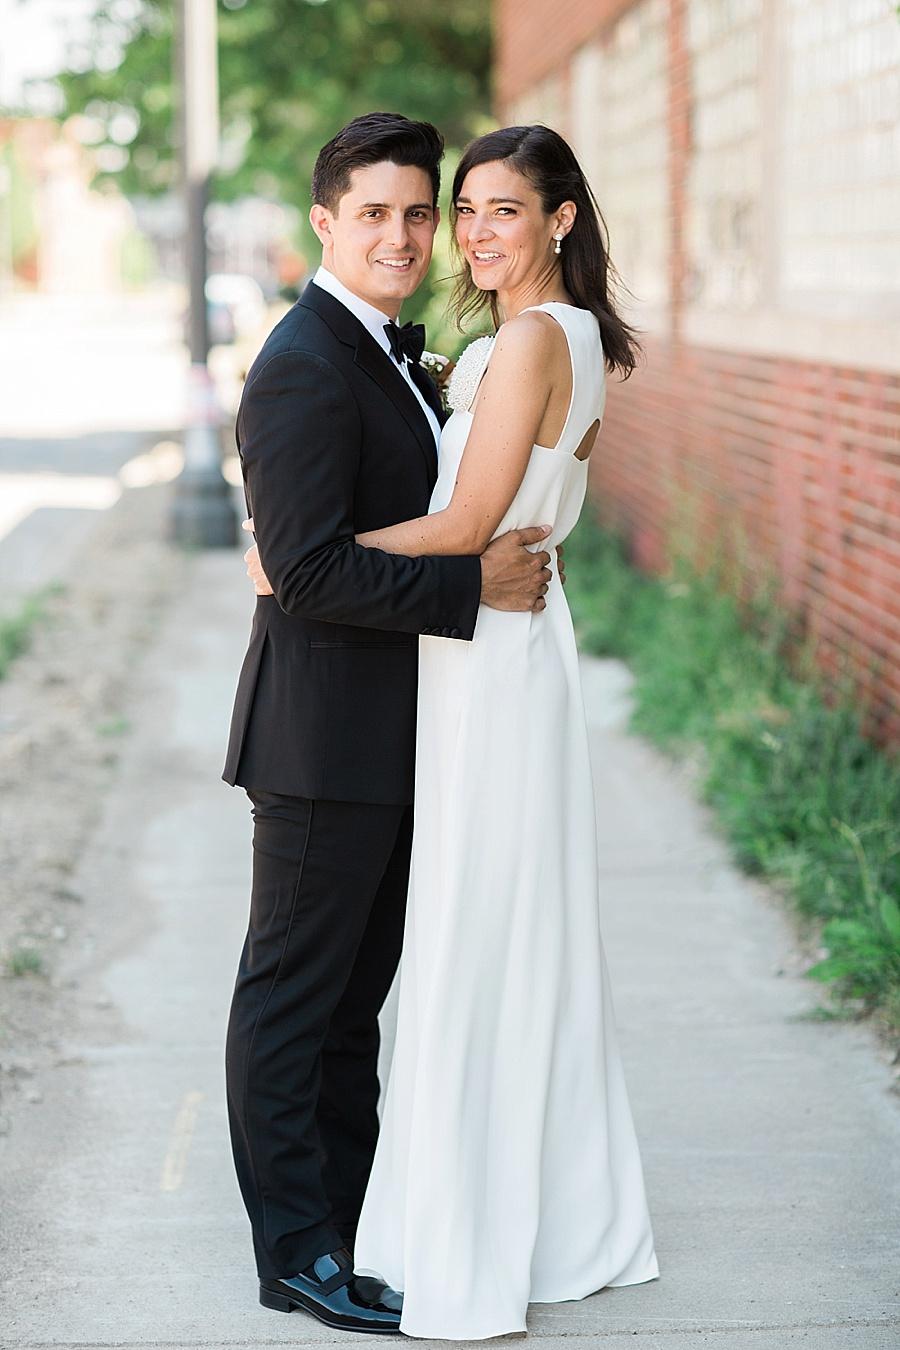 JR_Magat_Photography_Detroit_DIA_Wedding_0071.jpg